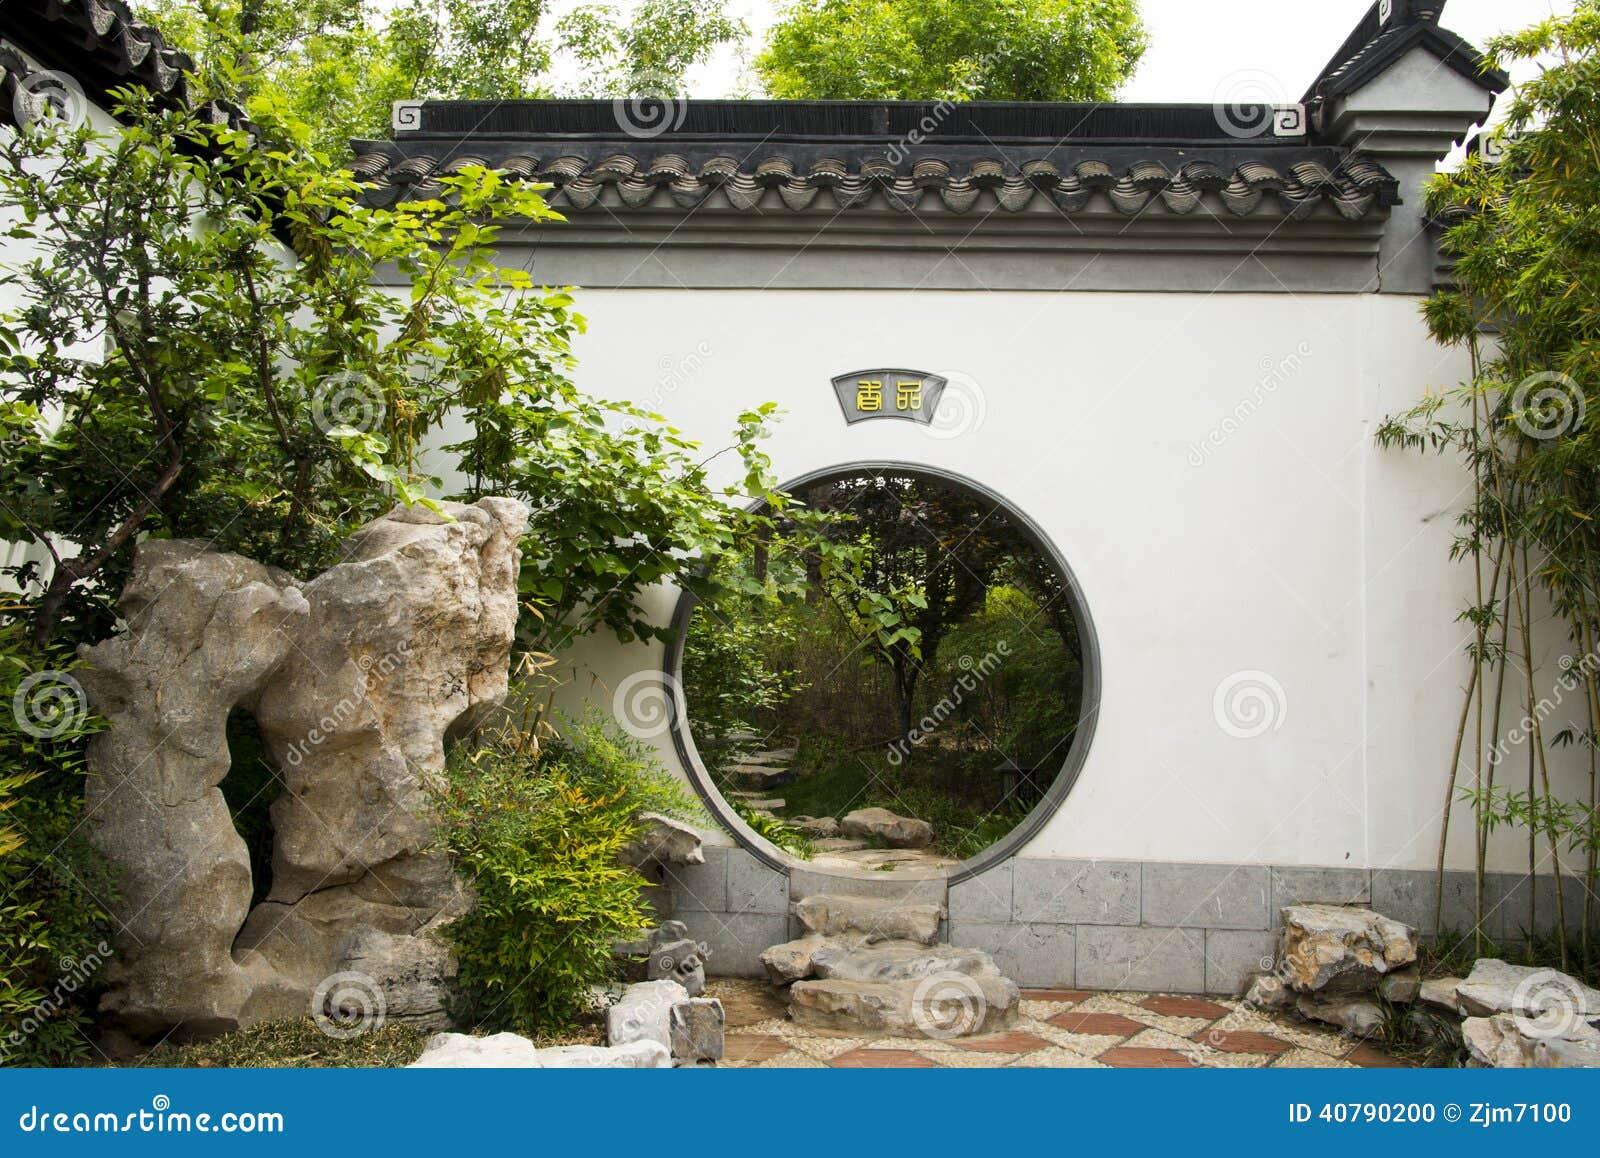 asiatique chine b timent antique cour porte circulaire bambou pierre photo stock image. Black Bedroom Furniture Sets. Home Design Ideas